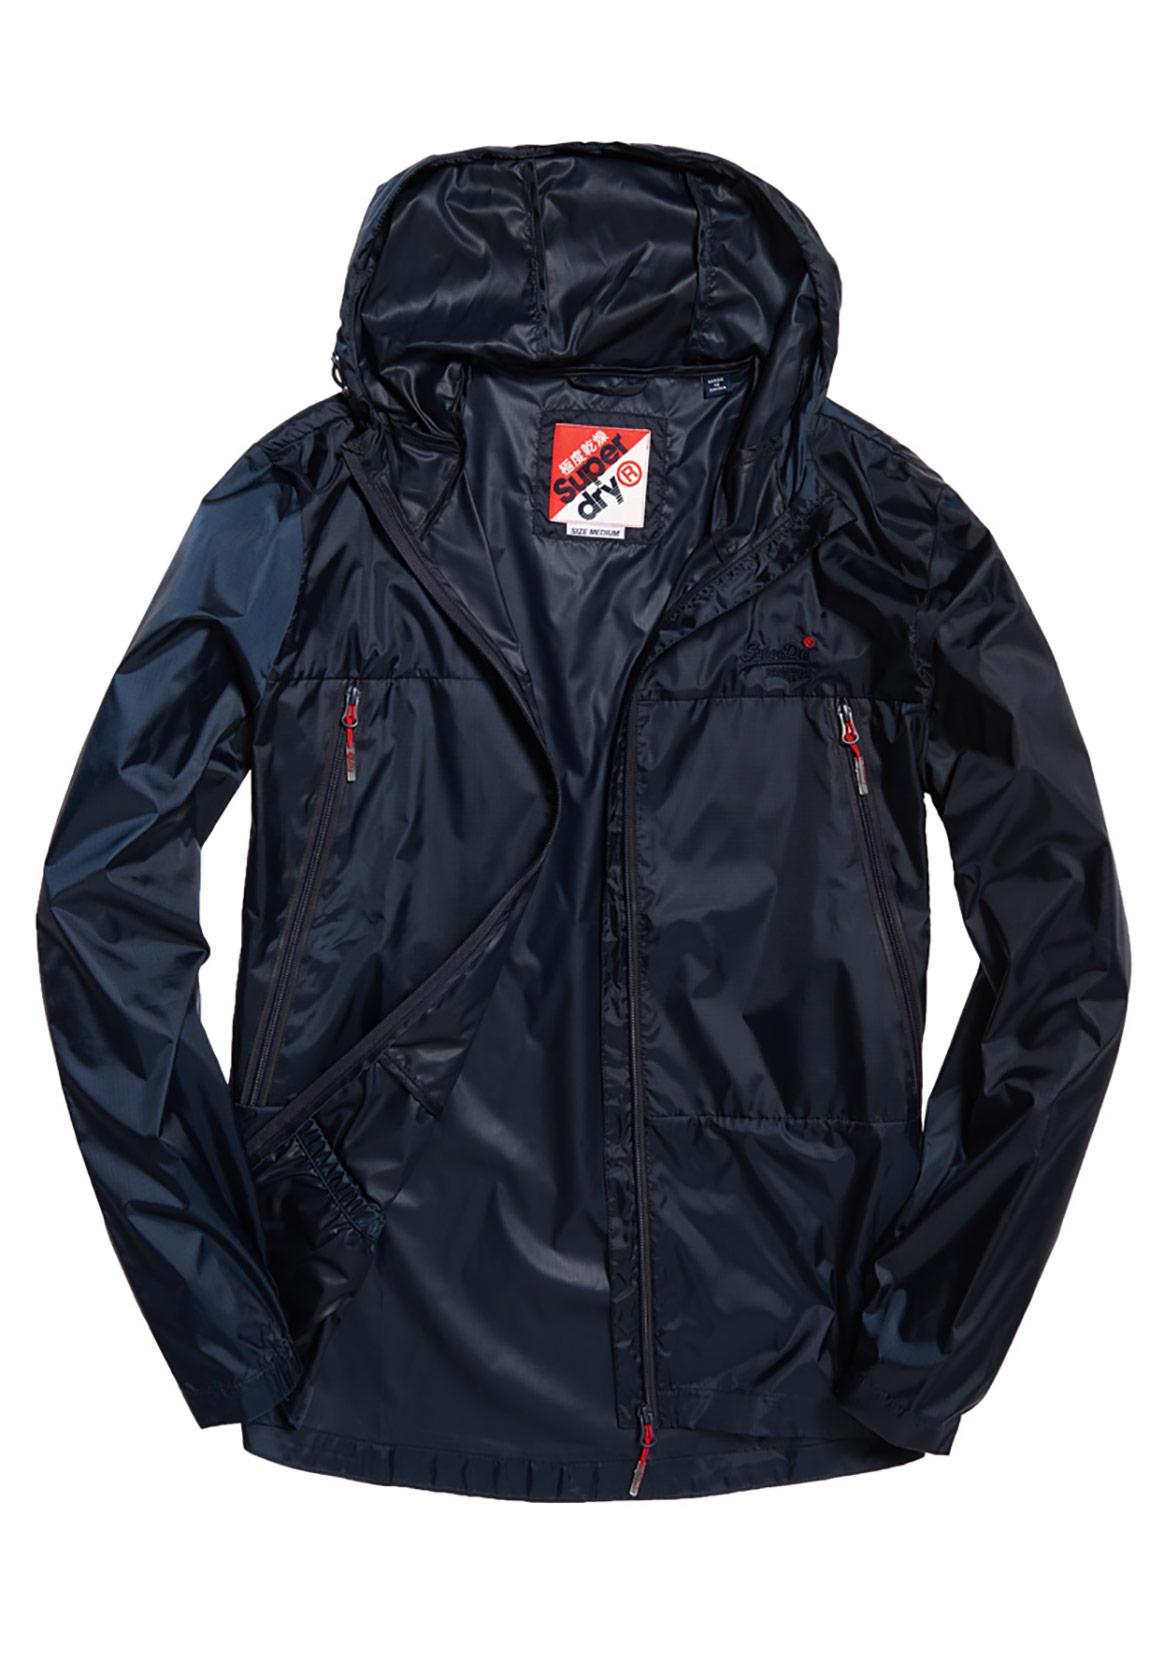 new product 00e49 5d7c4 Superdry Jacke Herren OFFSHORE PACKABLE CAGOULE Navy